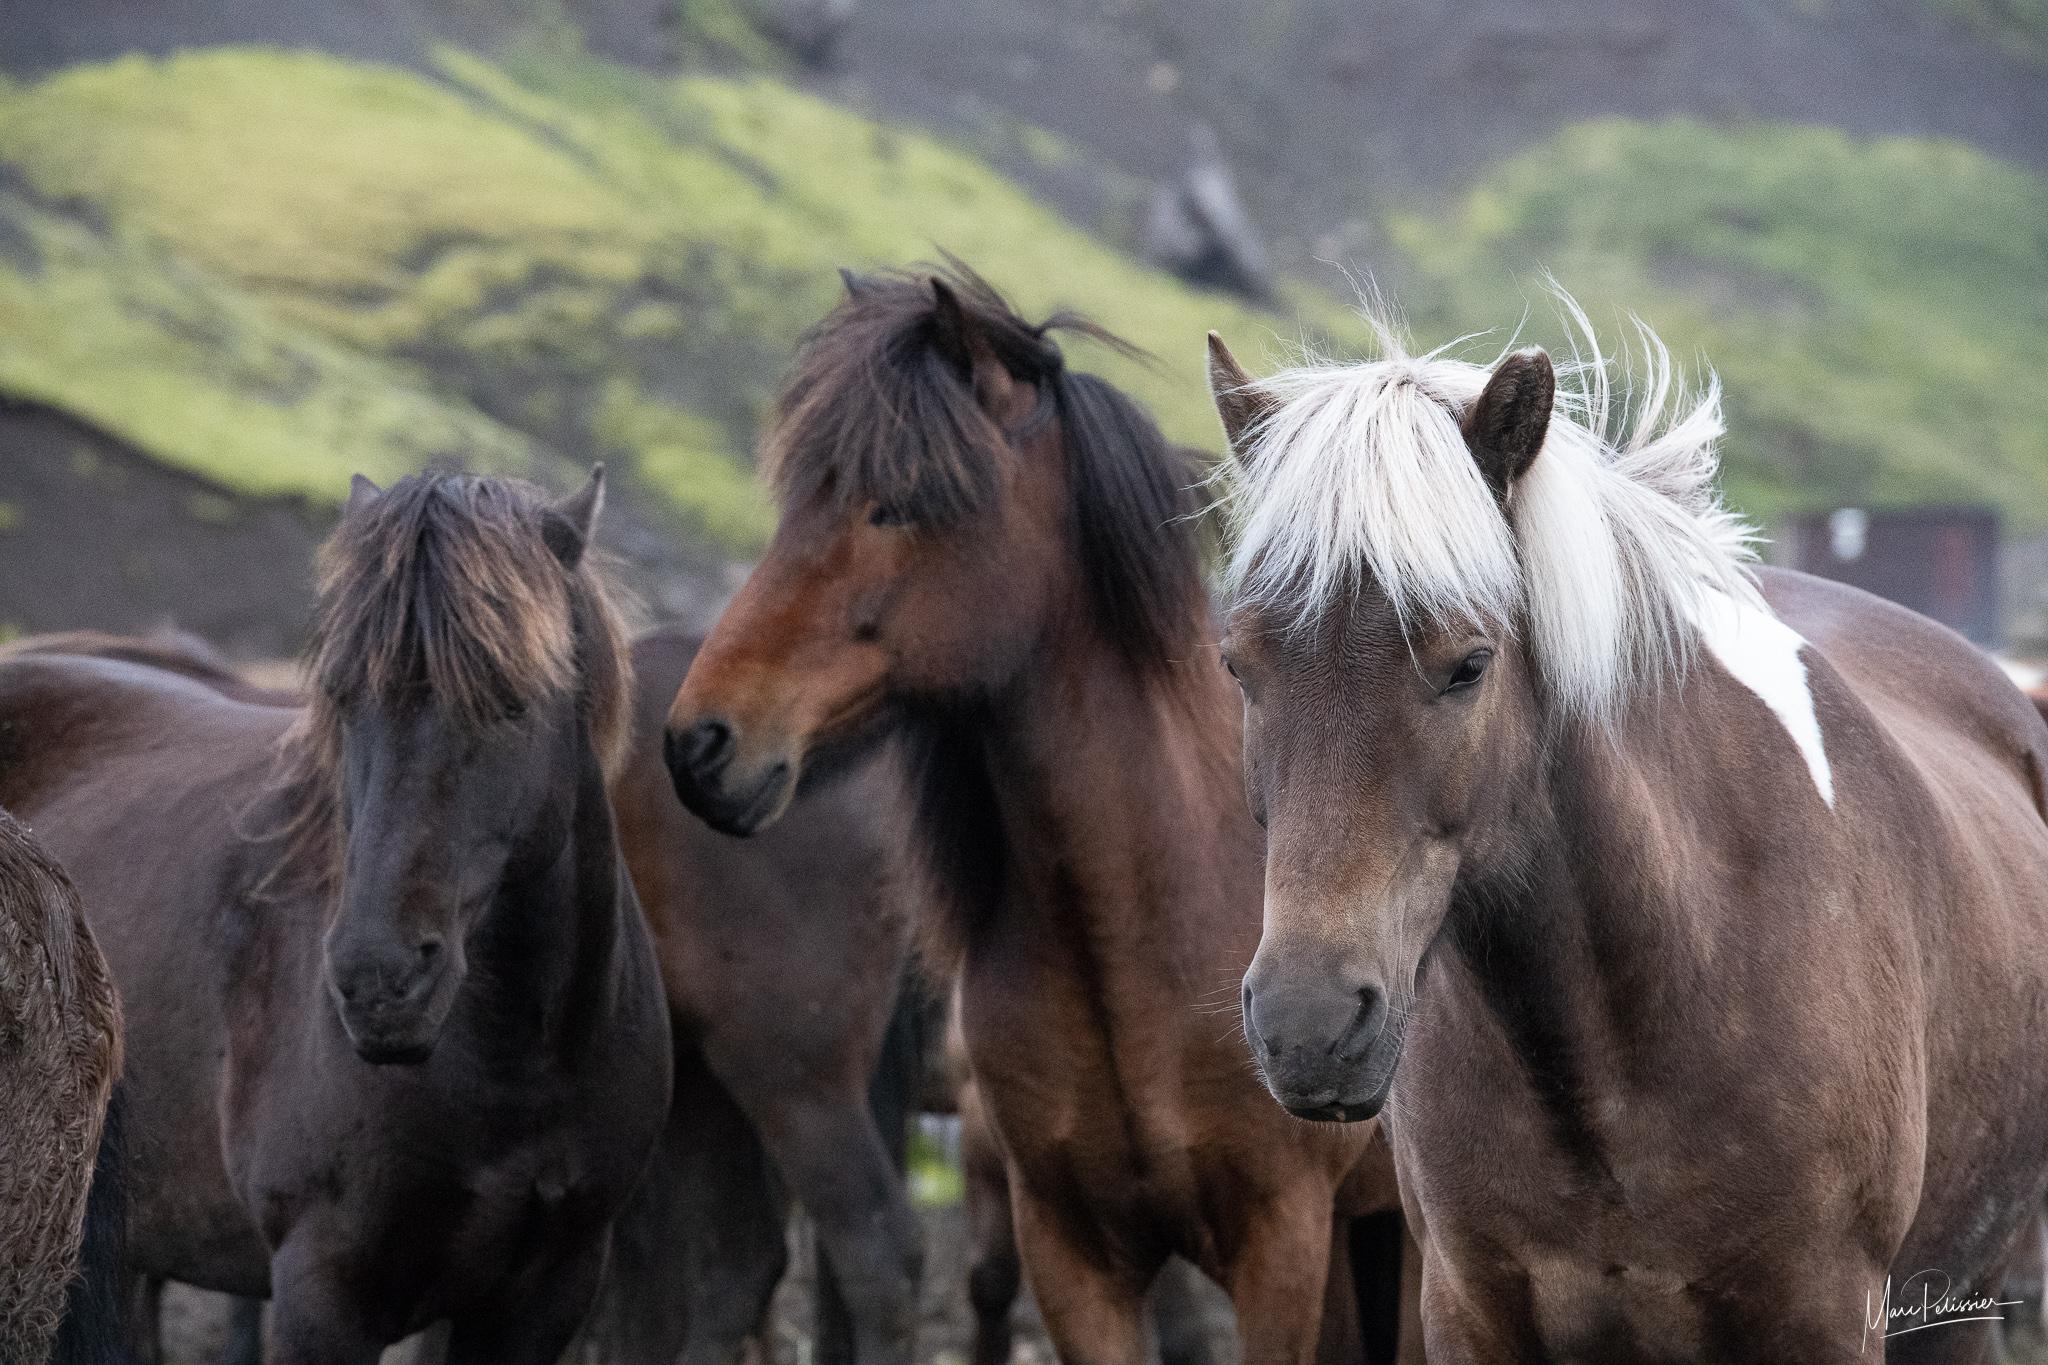 Kerlingarfjoll icelandic horses, Iceland